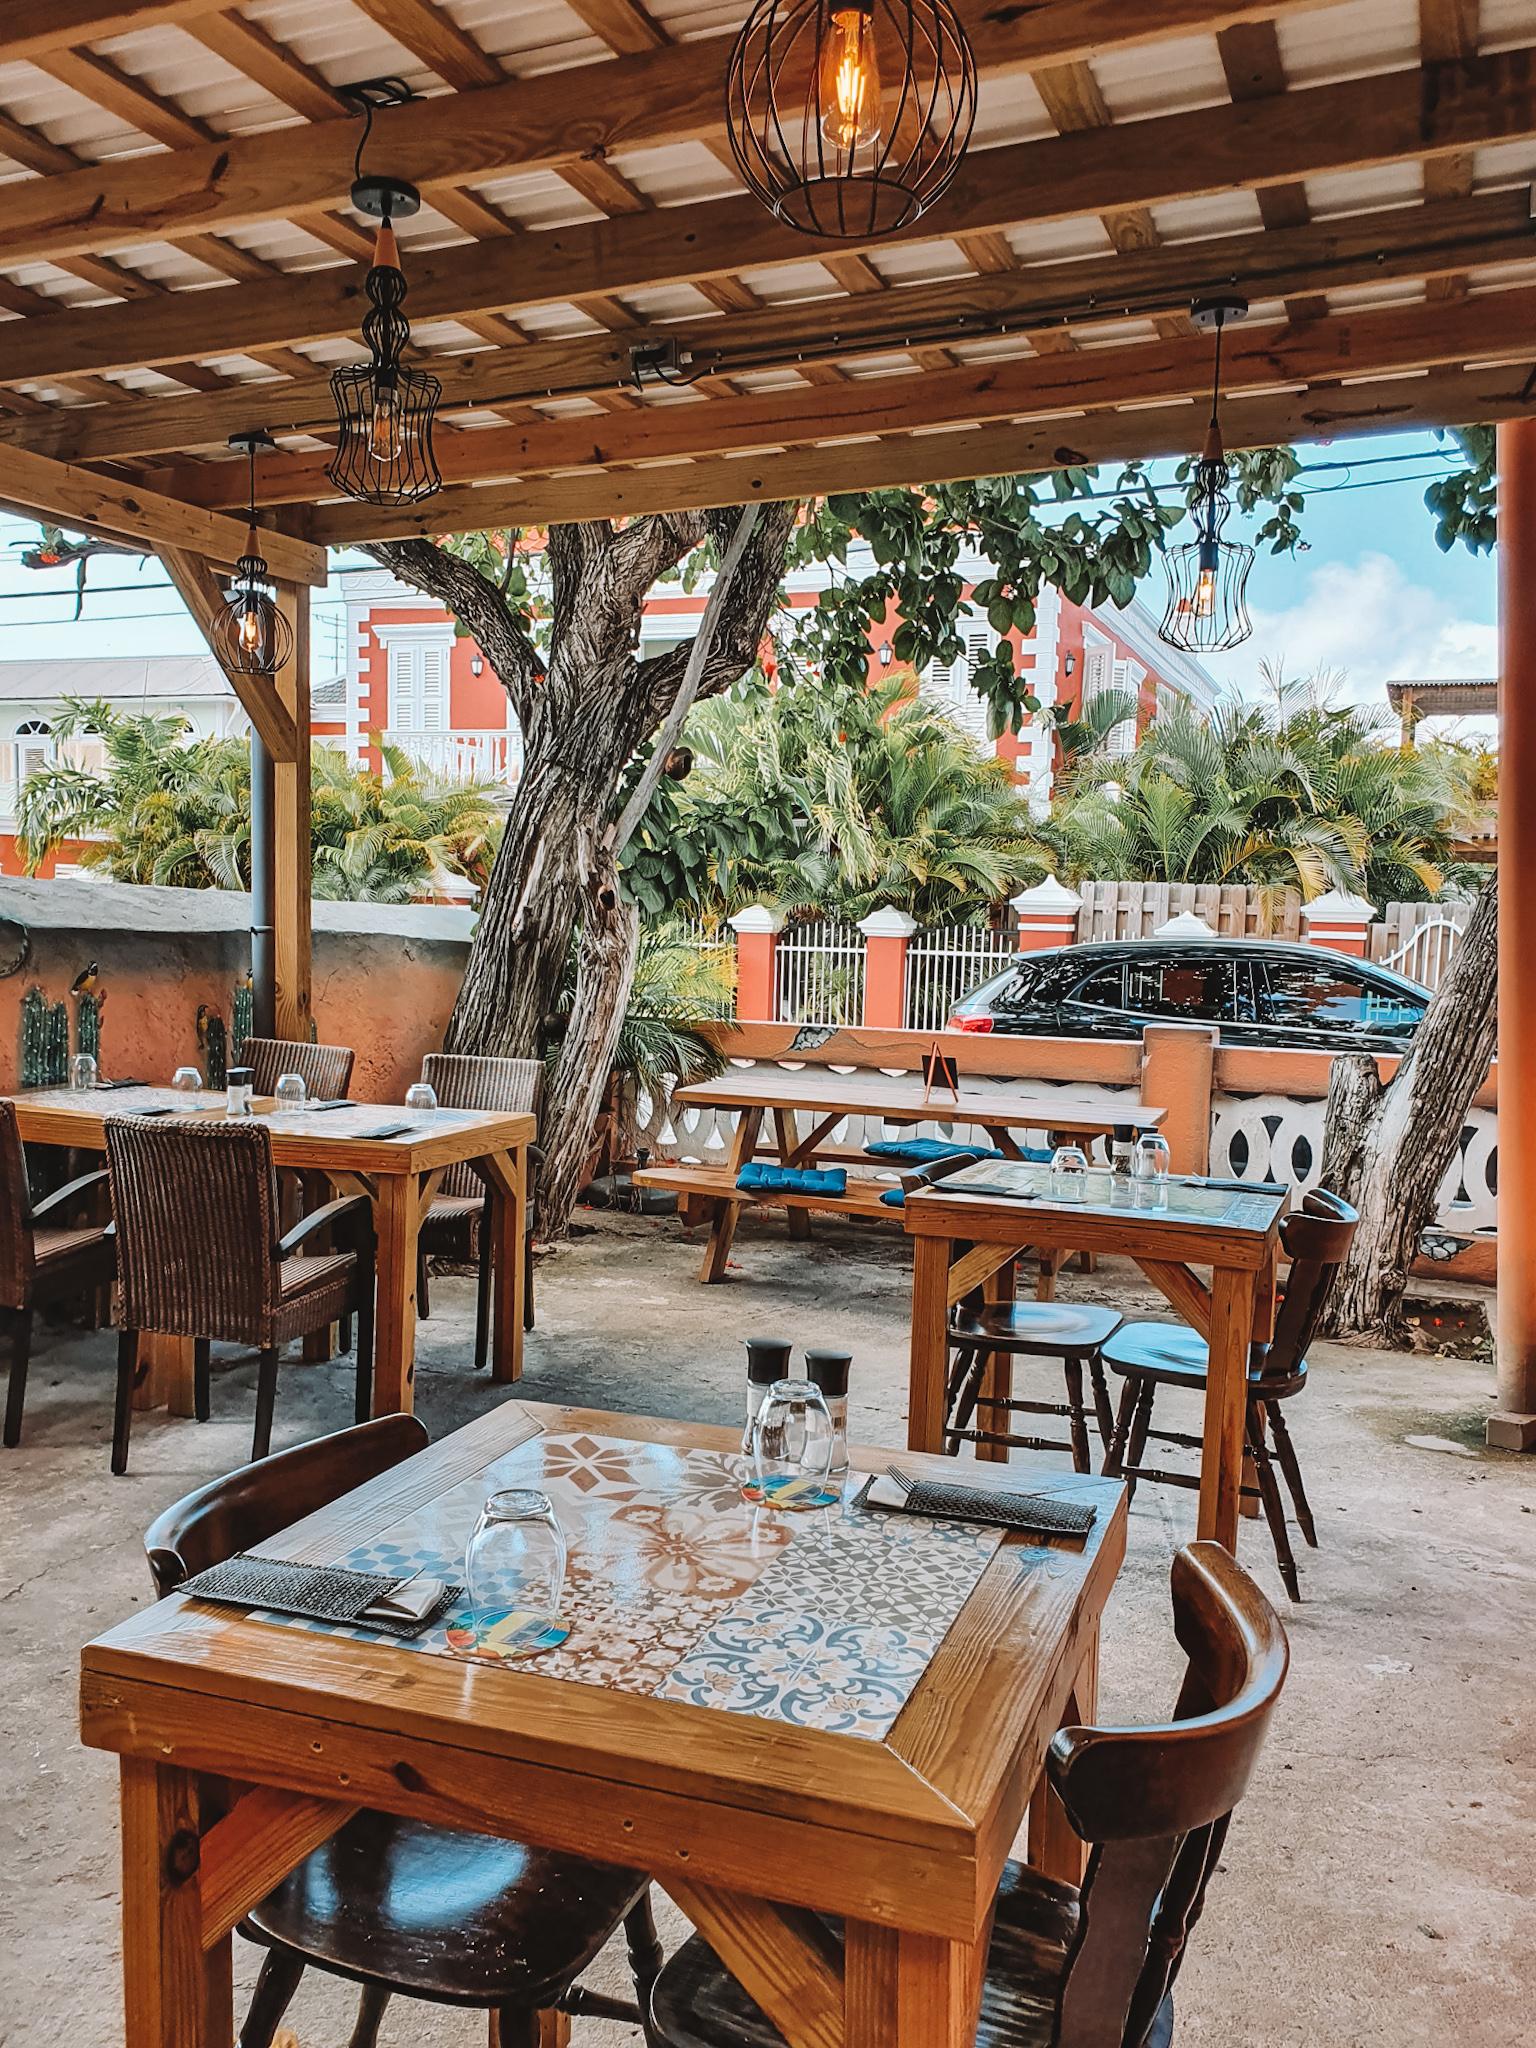 Maira's Curacao